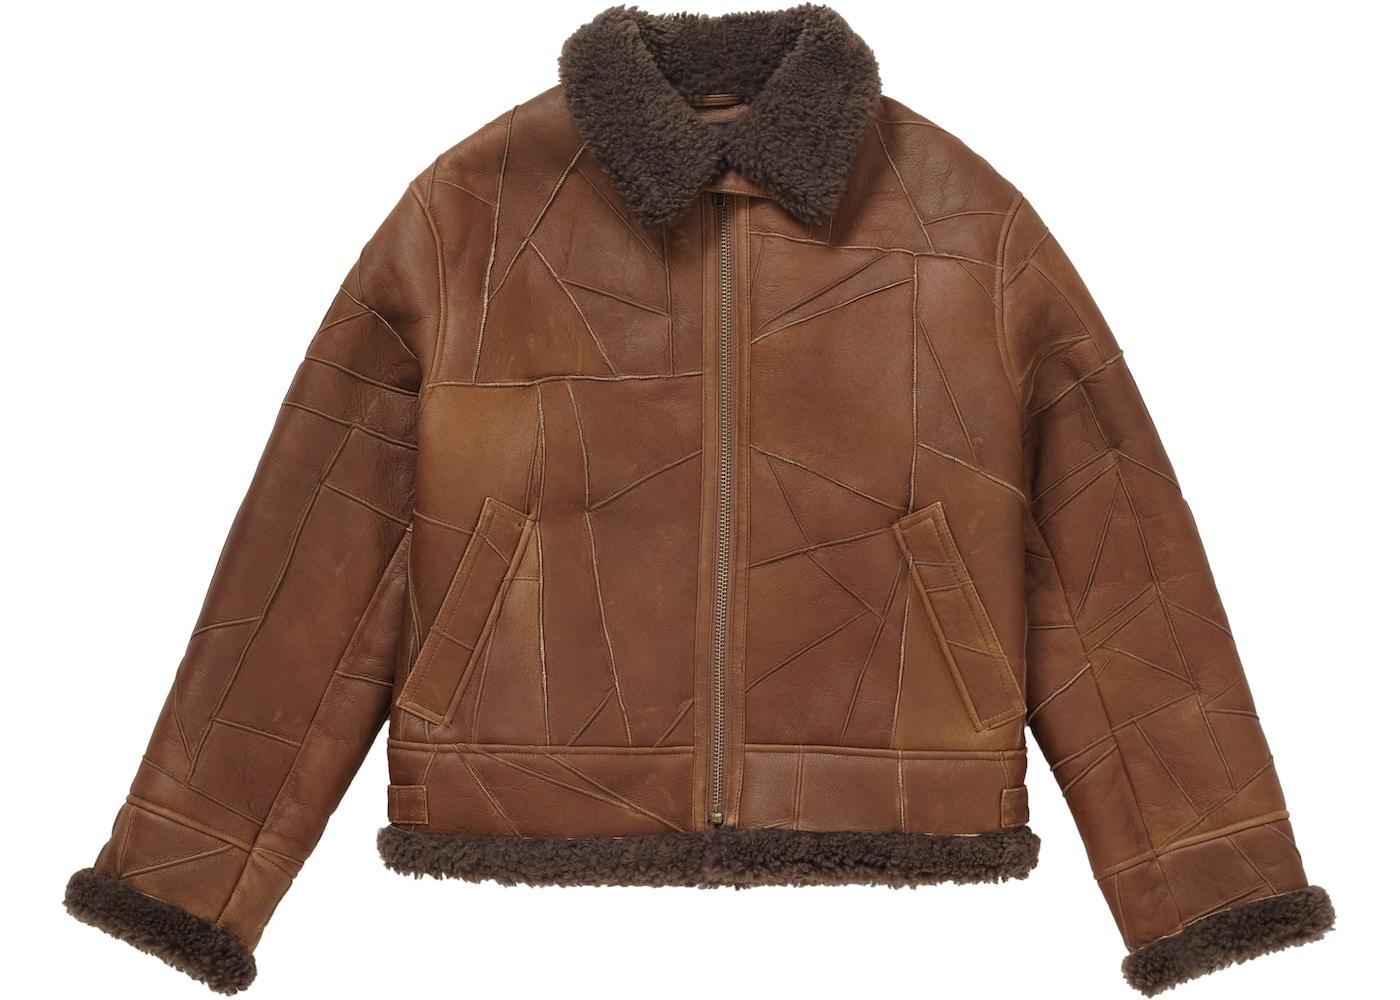 6f934308b Supreme Patchwork Shearling B-3 Jacket Brown